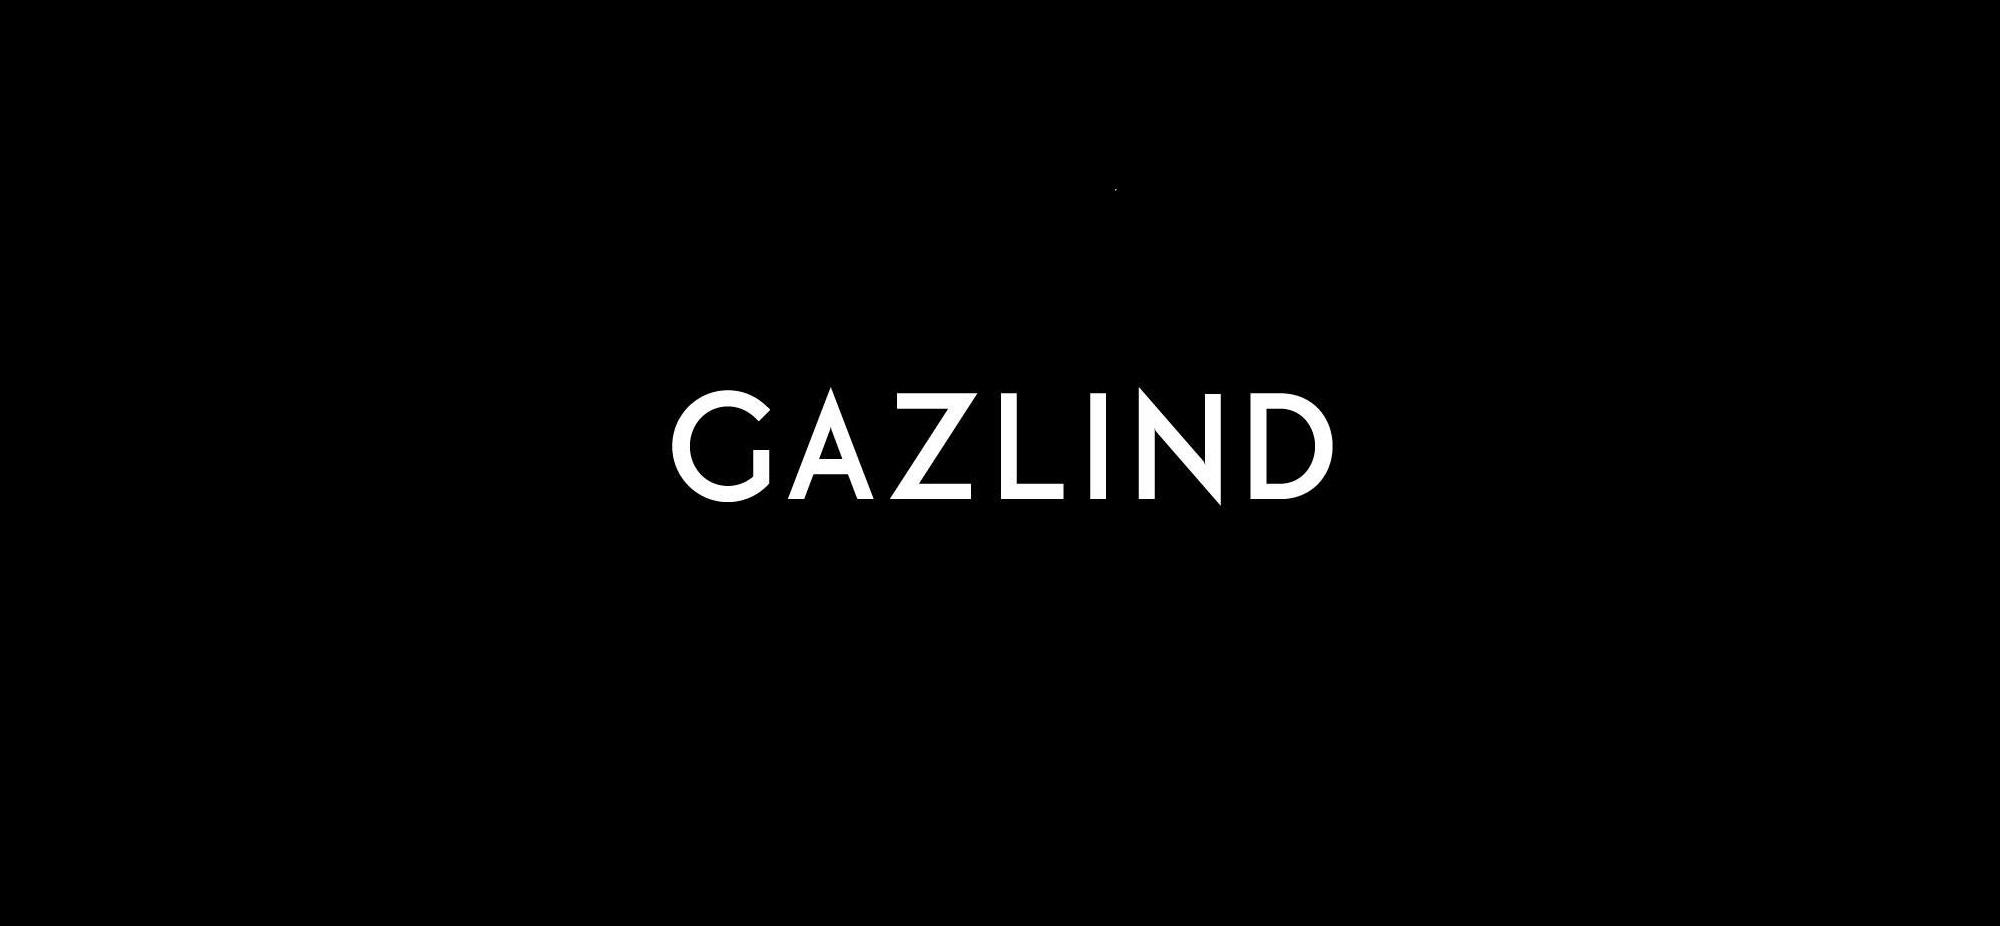 Gazlind – Sahara/Kiri [Buce Records]